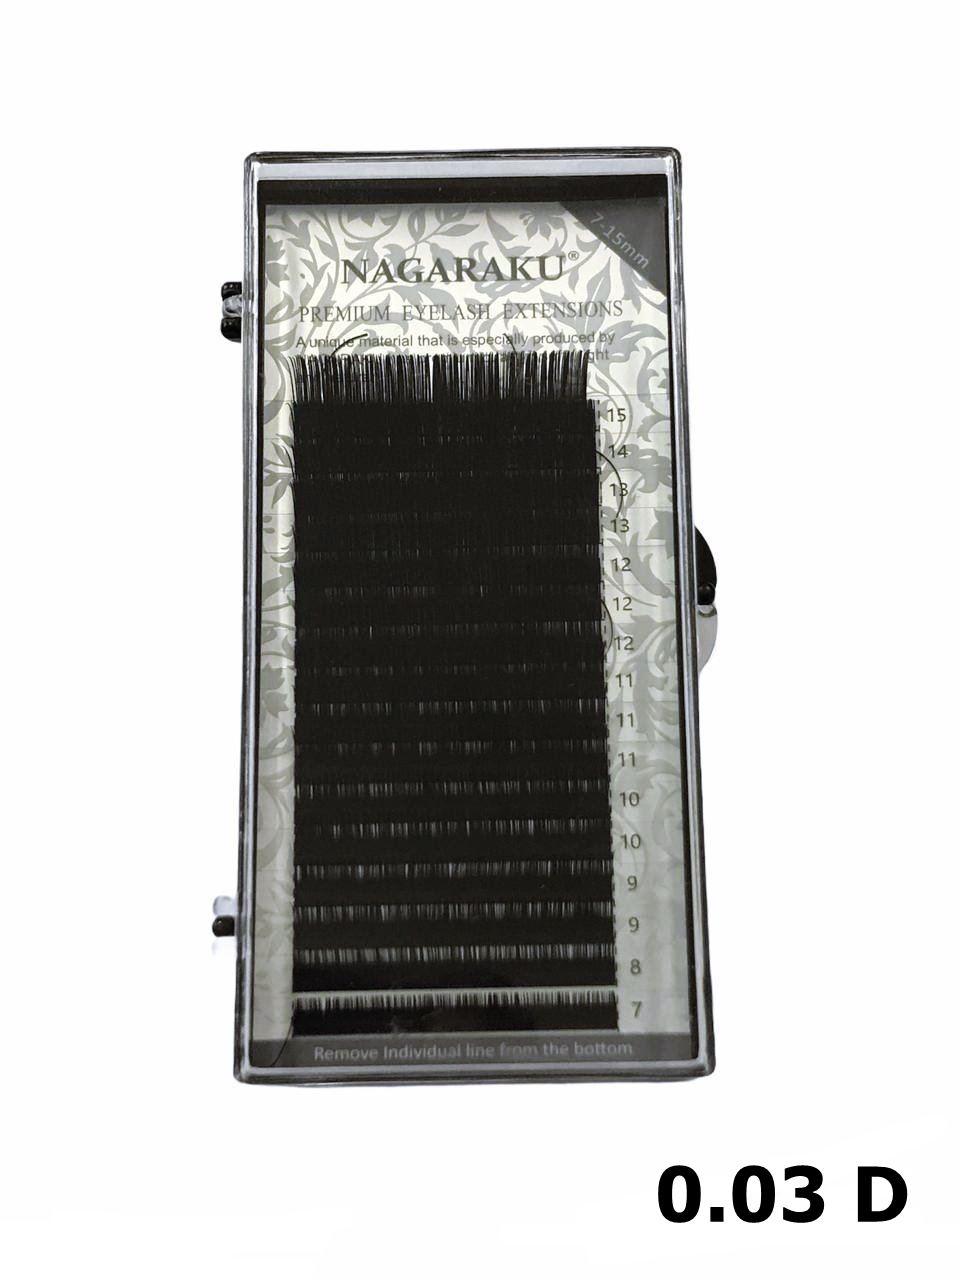 Cílios Nagaraku Premium Mink Mix 7-15mm Fio A Fio 0.03 D